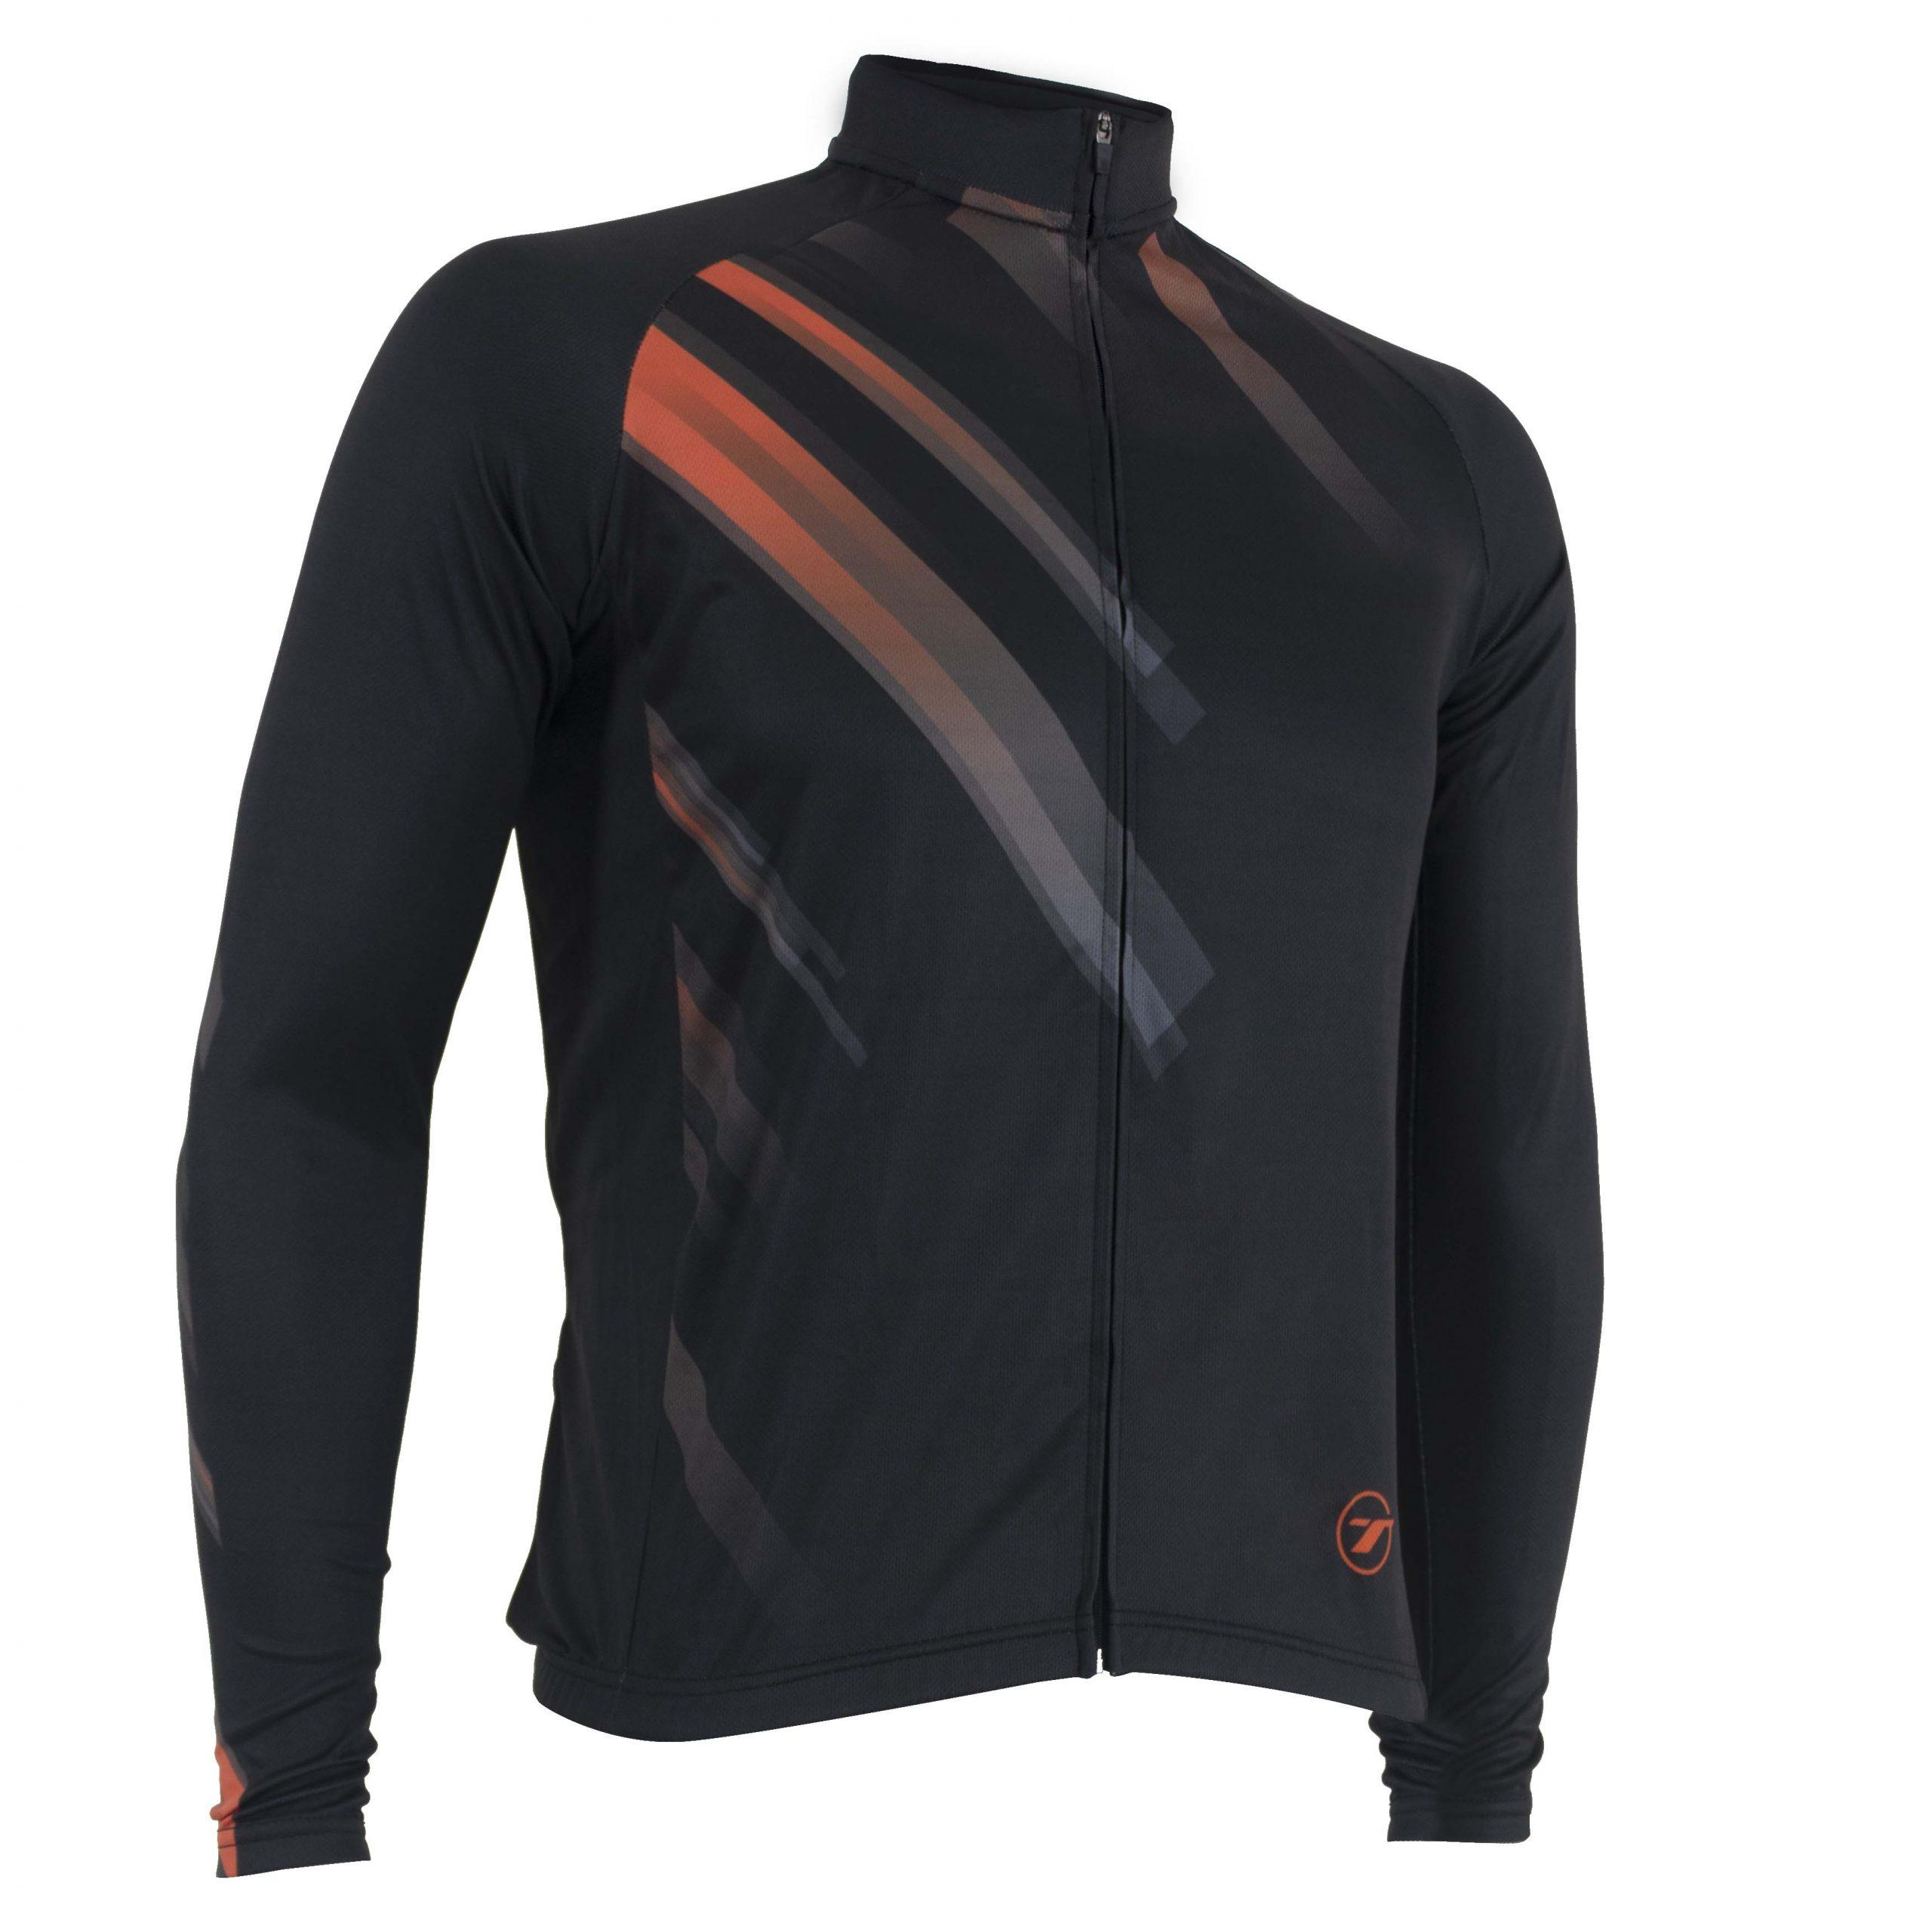 Camisa manga longa para ciclismo SUNNY | RIDE LINE 3